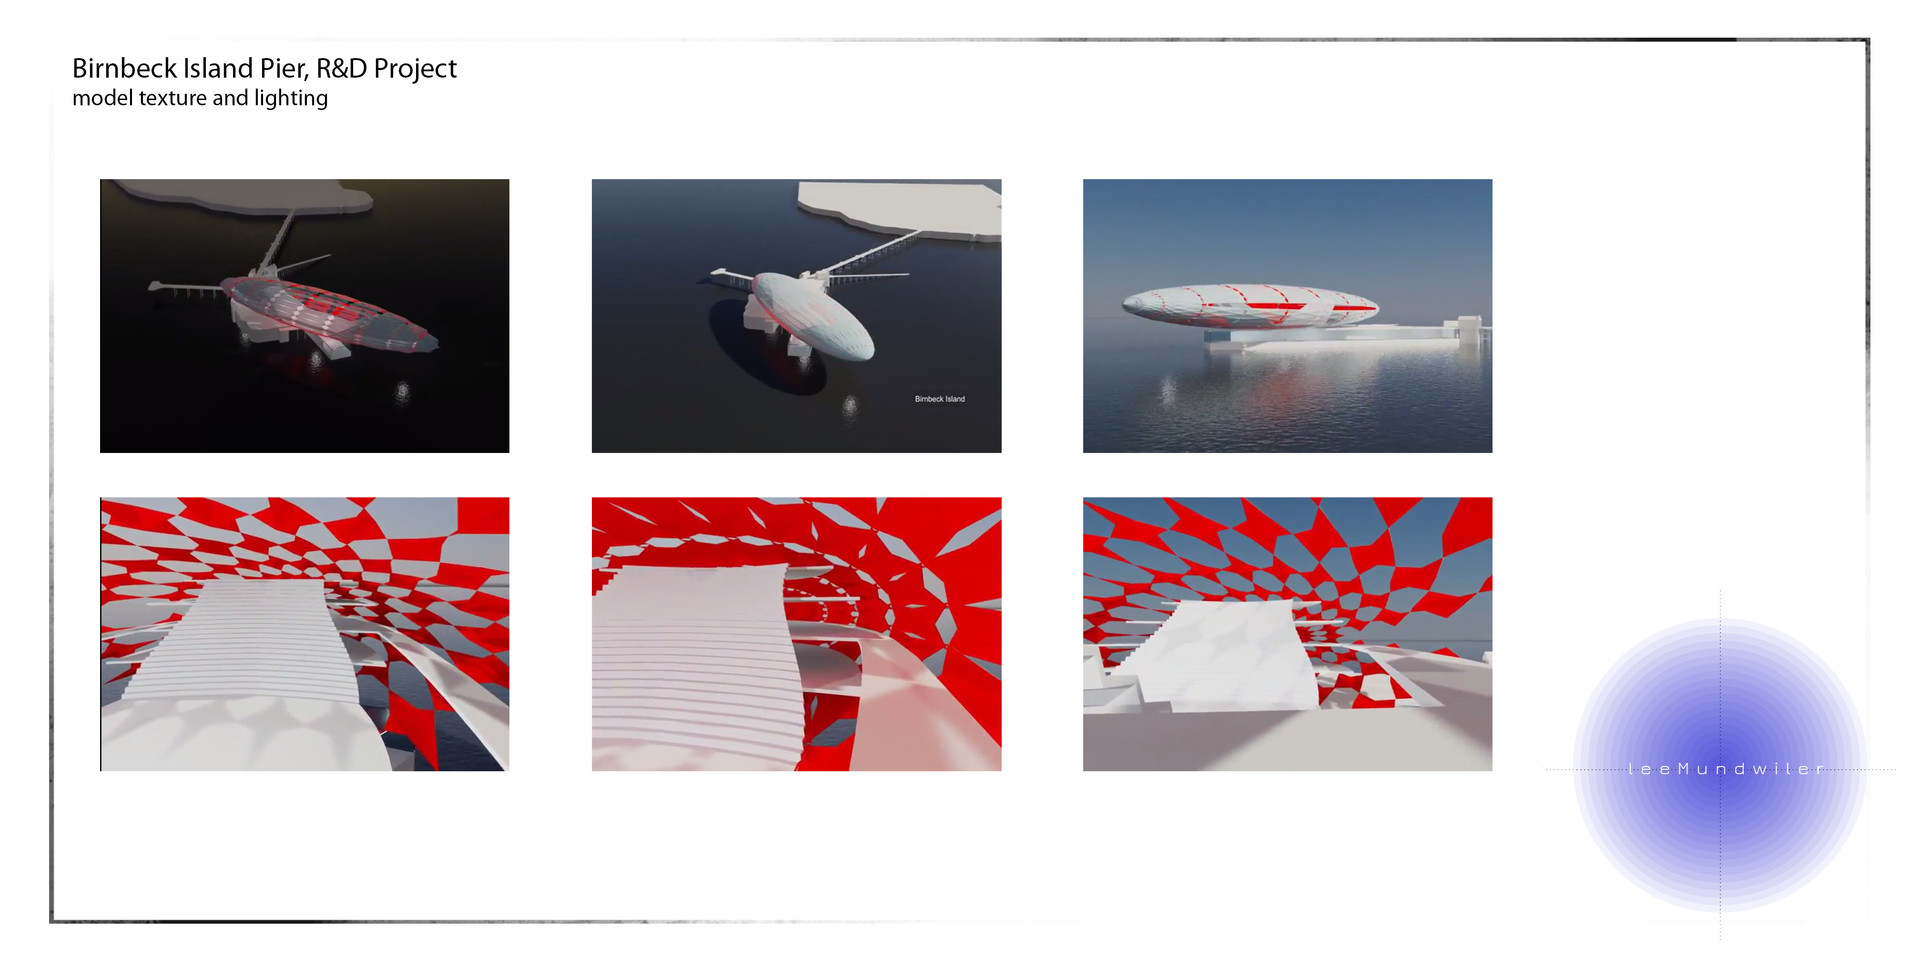 Birnbeck Island Pier redevelopment: Model, Structure animation texture and lighting